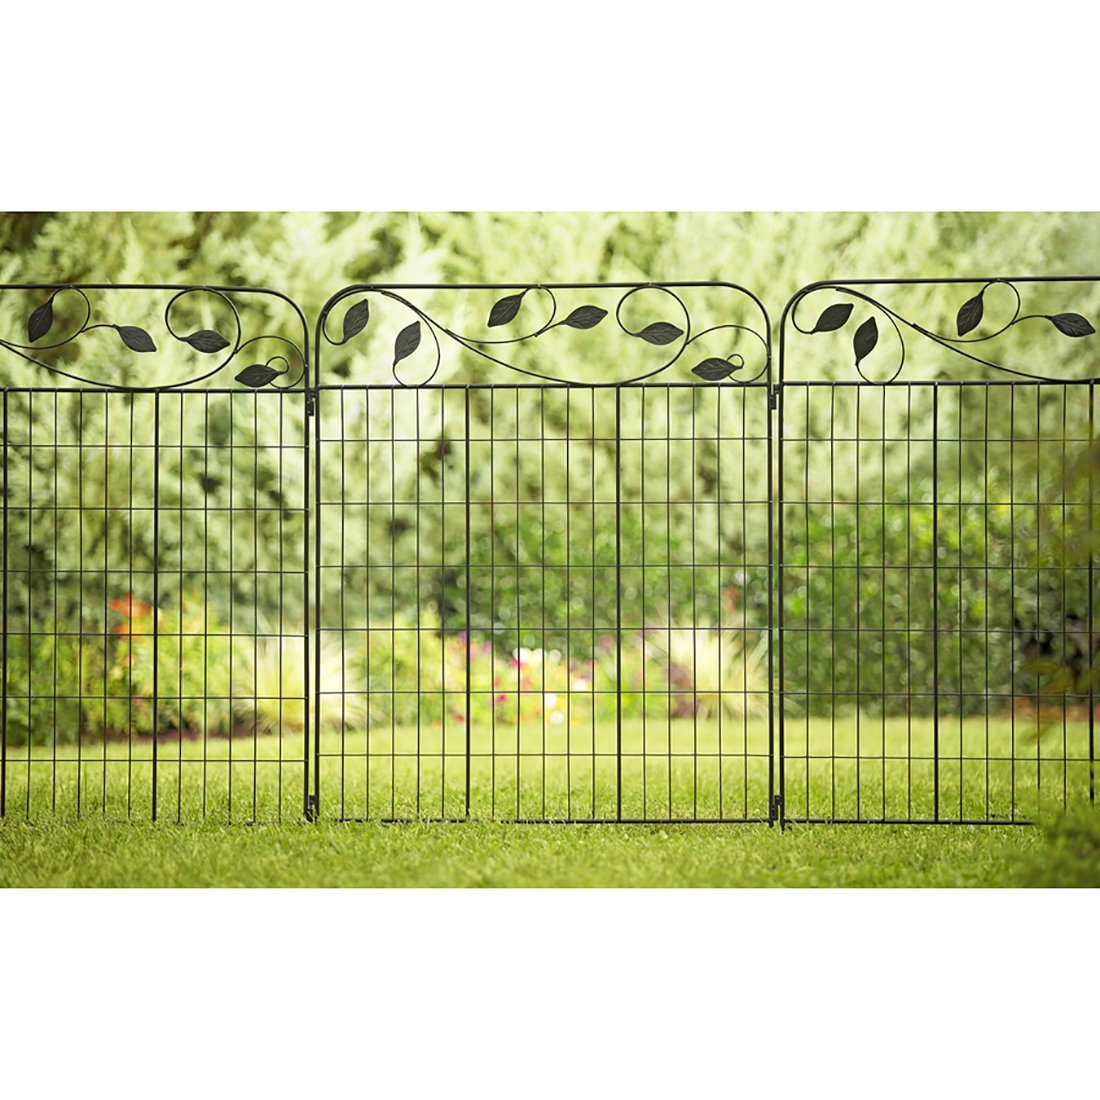 Amazon amagabeli decorative garden fence 36x 44 x 2 panels amazon amagabeli decorative garden fence 36x 44 x 2 panels metal wire fencing outdoor patio decor landscape folding black wrought iron border edging baanklon Choice Image